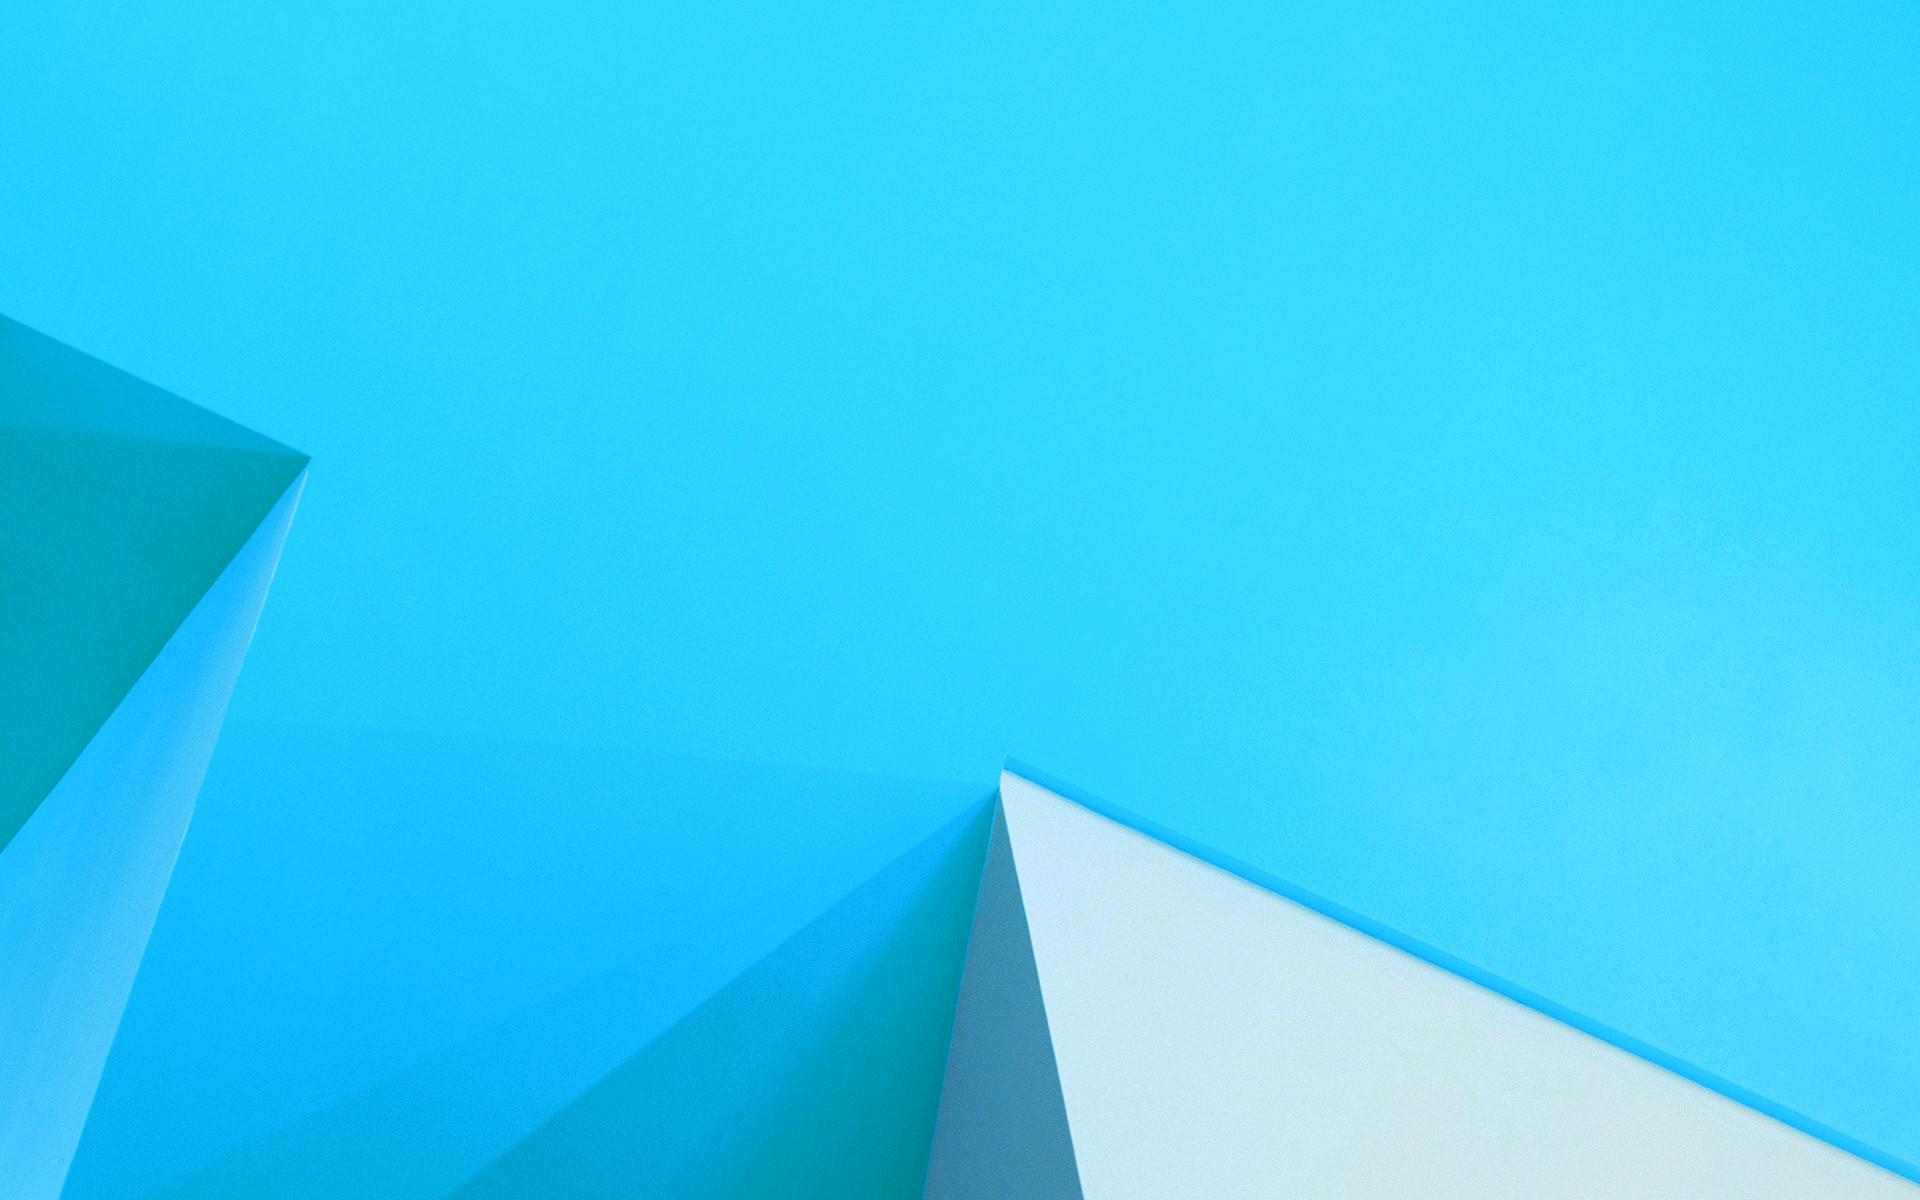 Windows 8 1 Blue Wallpaper Wallpapersafari